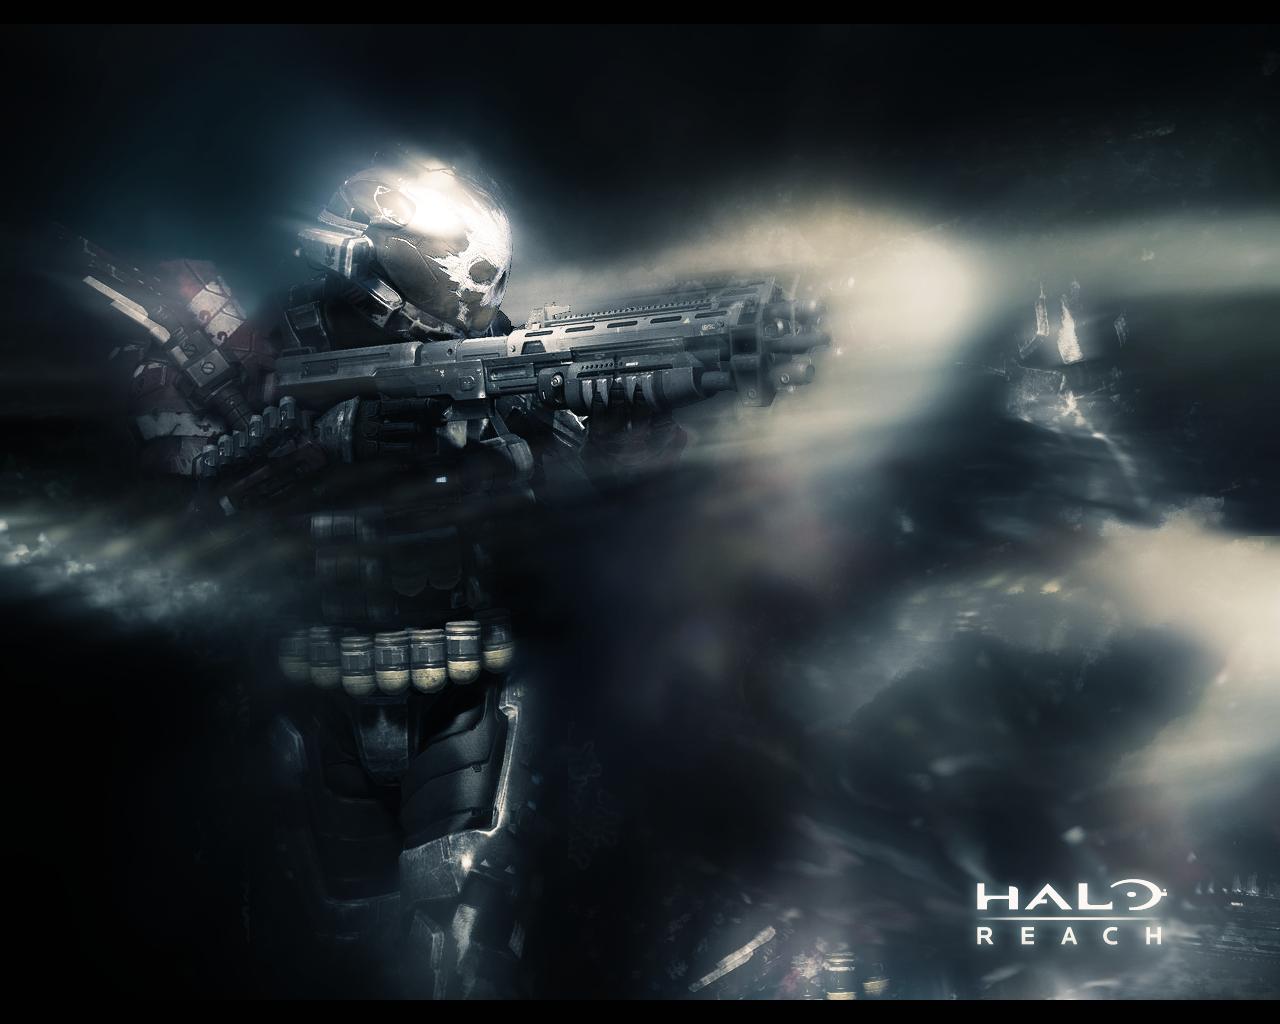 Halo Reach Wallpapers HD - WallpaperSafari